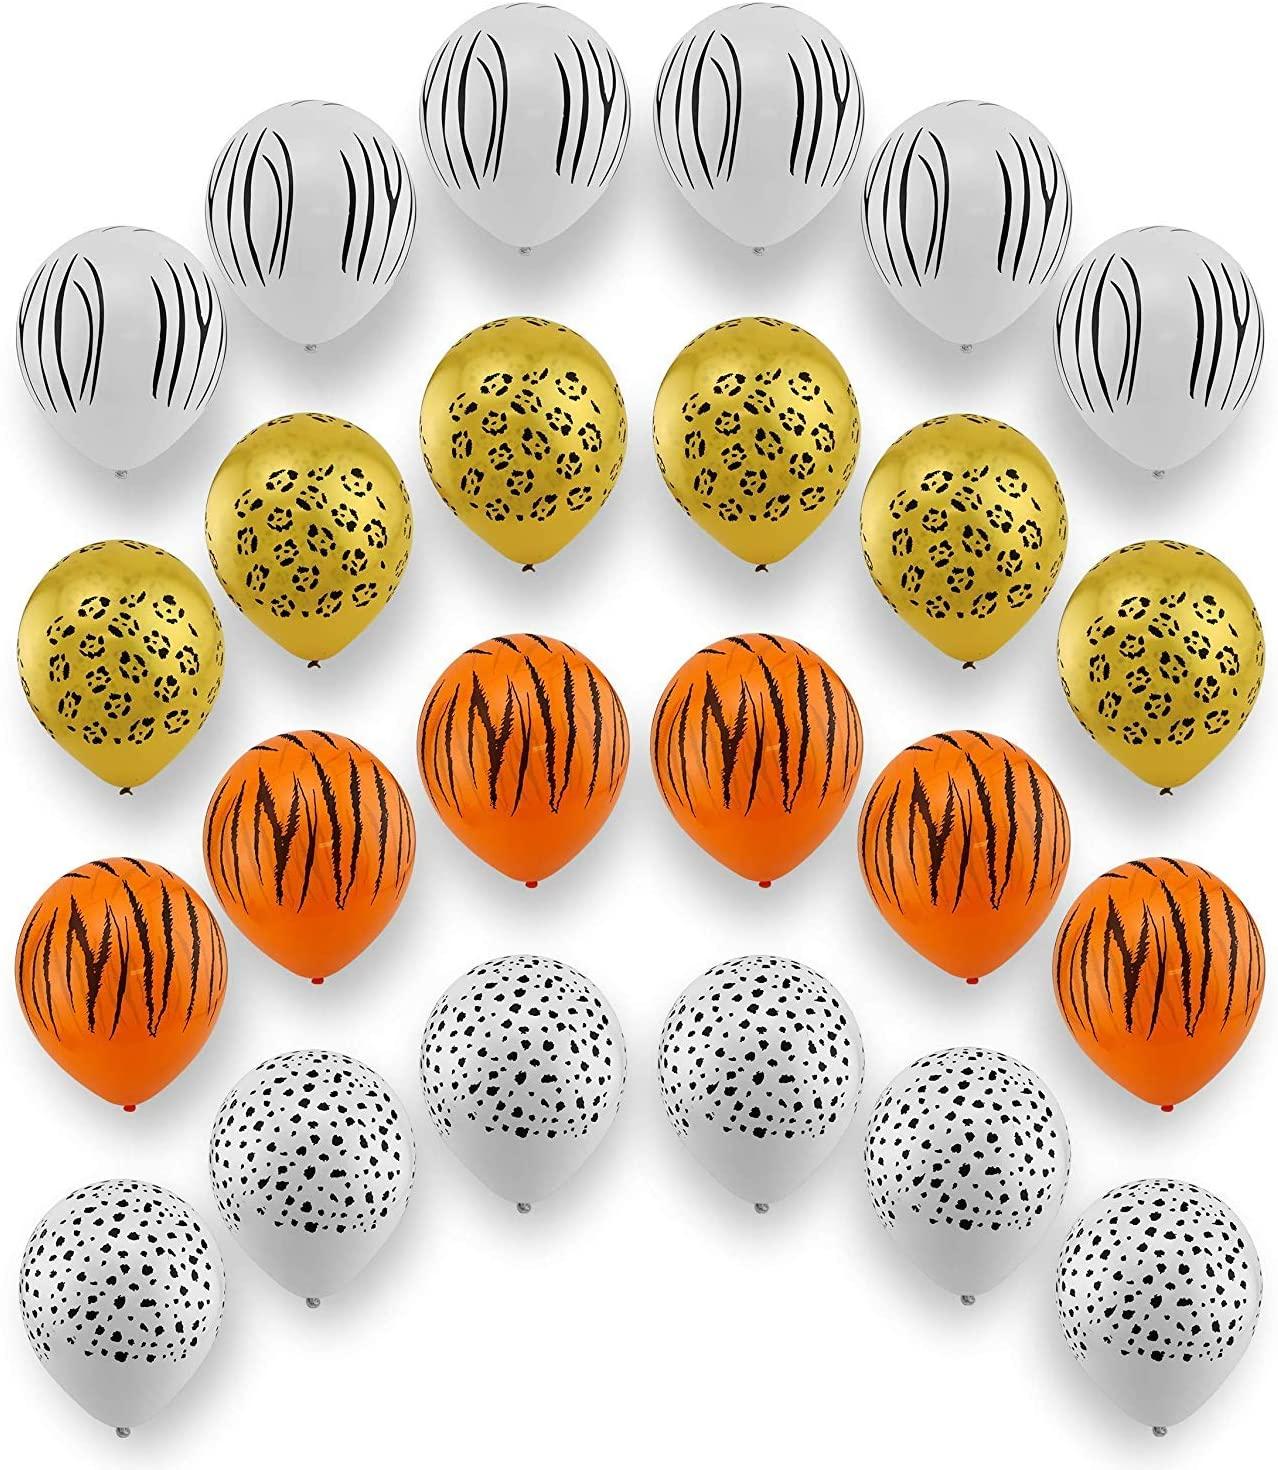 24 Pack Jungle Safari Animal Balloons Safari Zoo Animals Party Supplies Jungle Birthday Party Birthday Decorations